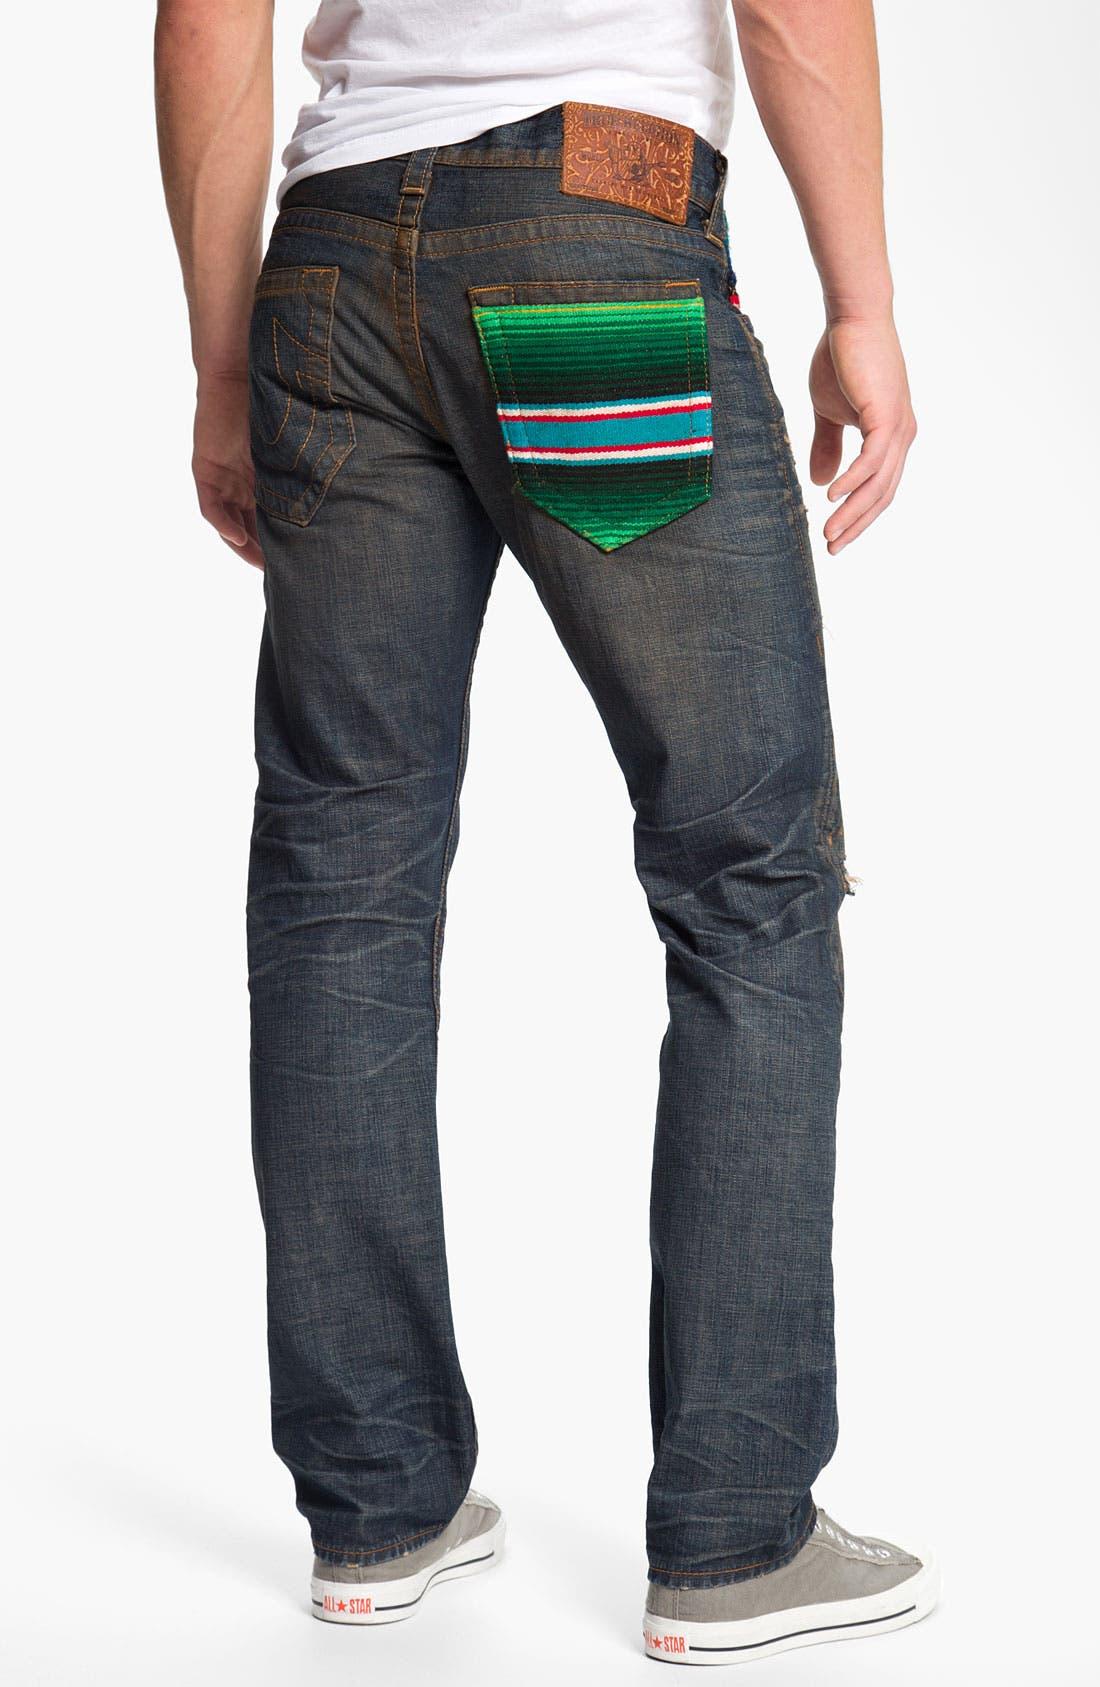 Main Image - True Religion Brand Jeans 'Geno Baja' Slim Straight Leg Jeans (Proclamation)